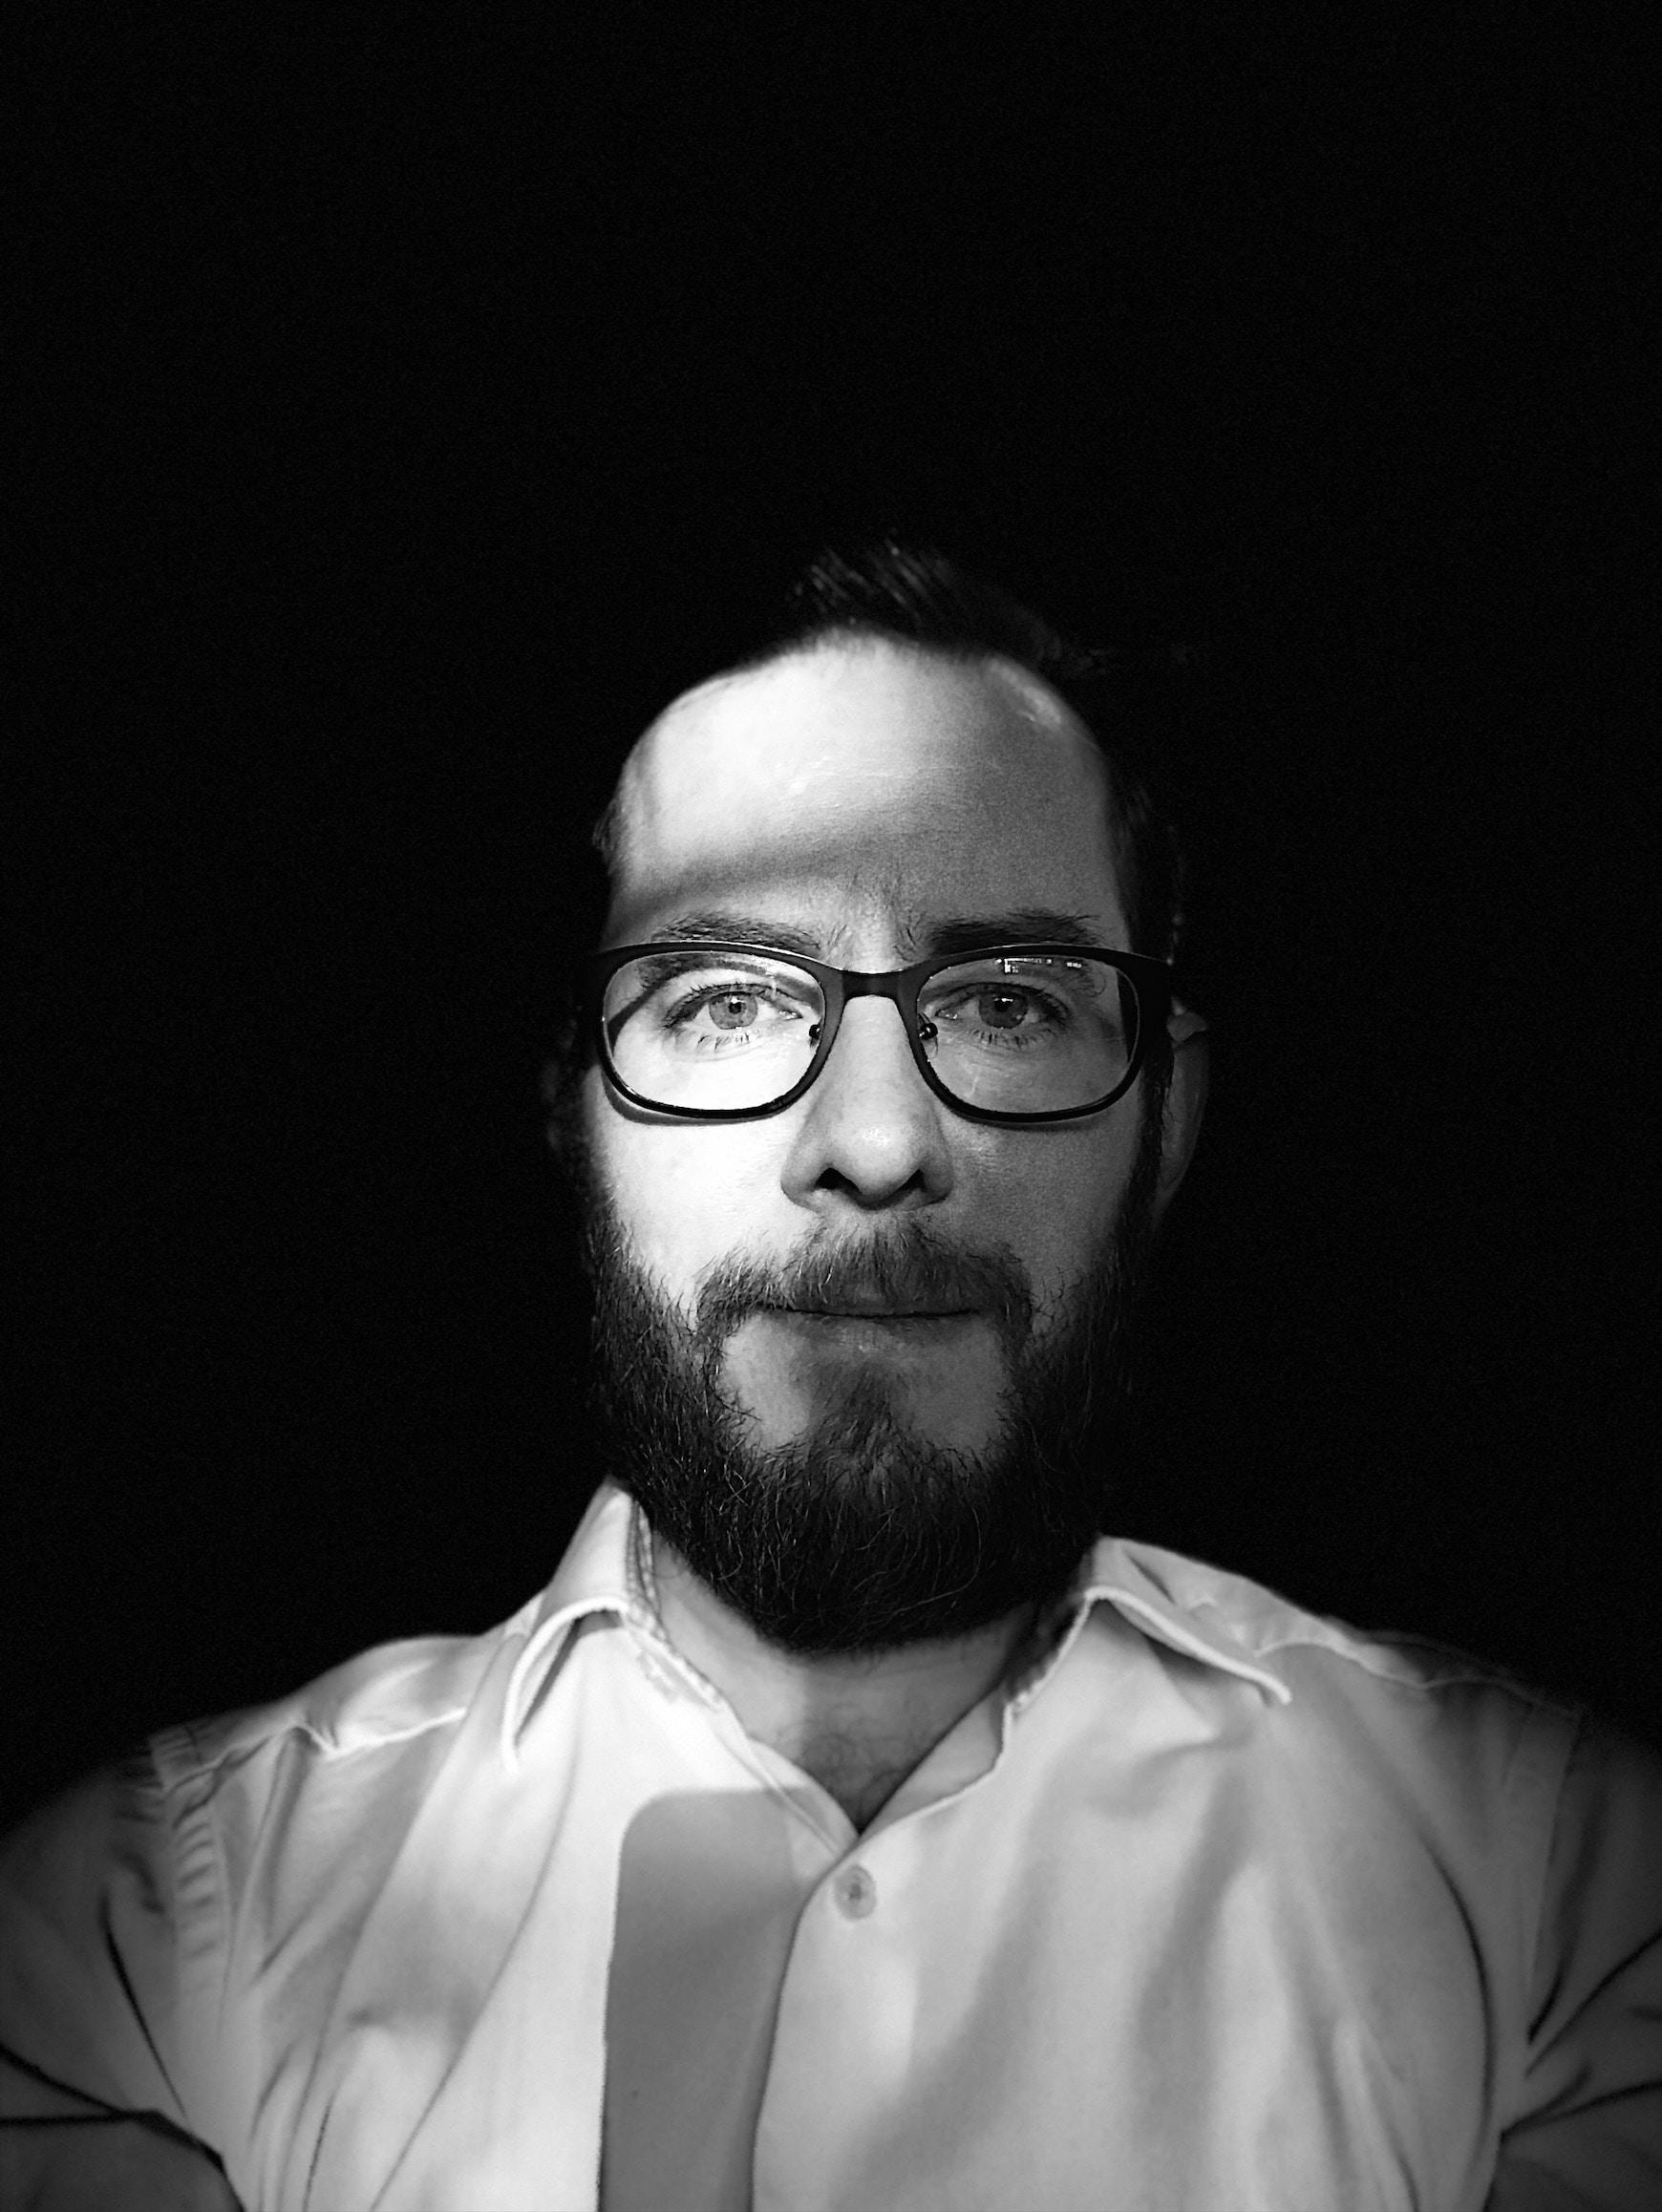 Go to Árni Svanur Daníelsson's profile